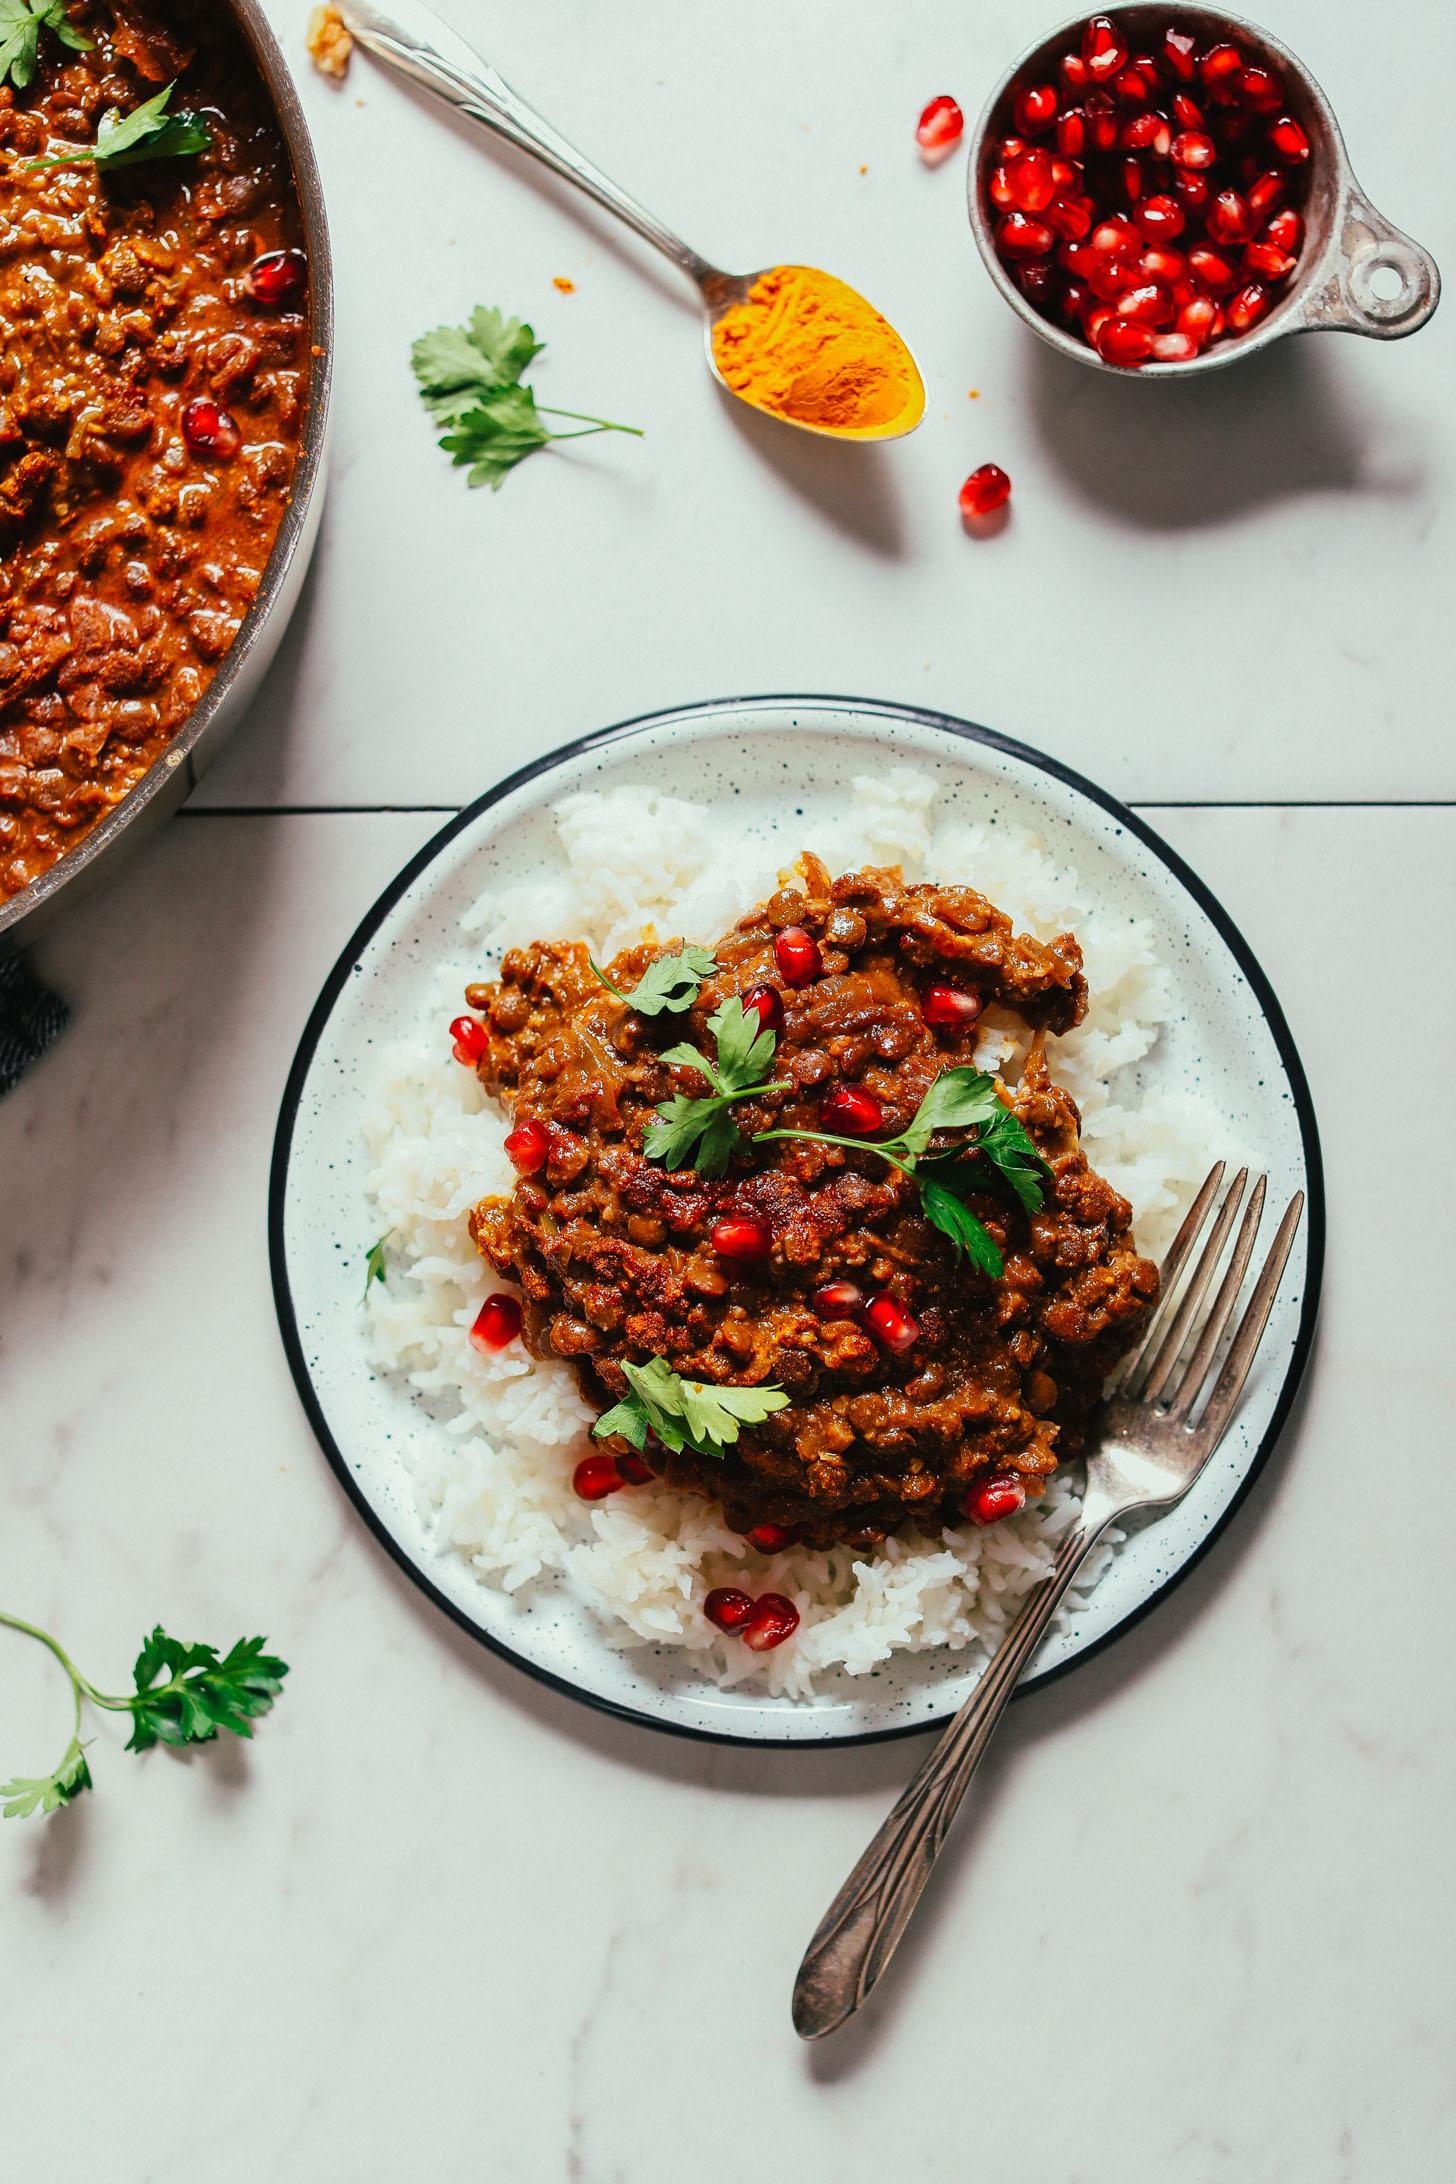 Plate of Lentil Fesenjan over rice for a hearty gluten-free vegan meal